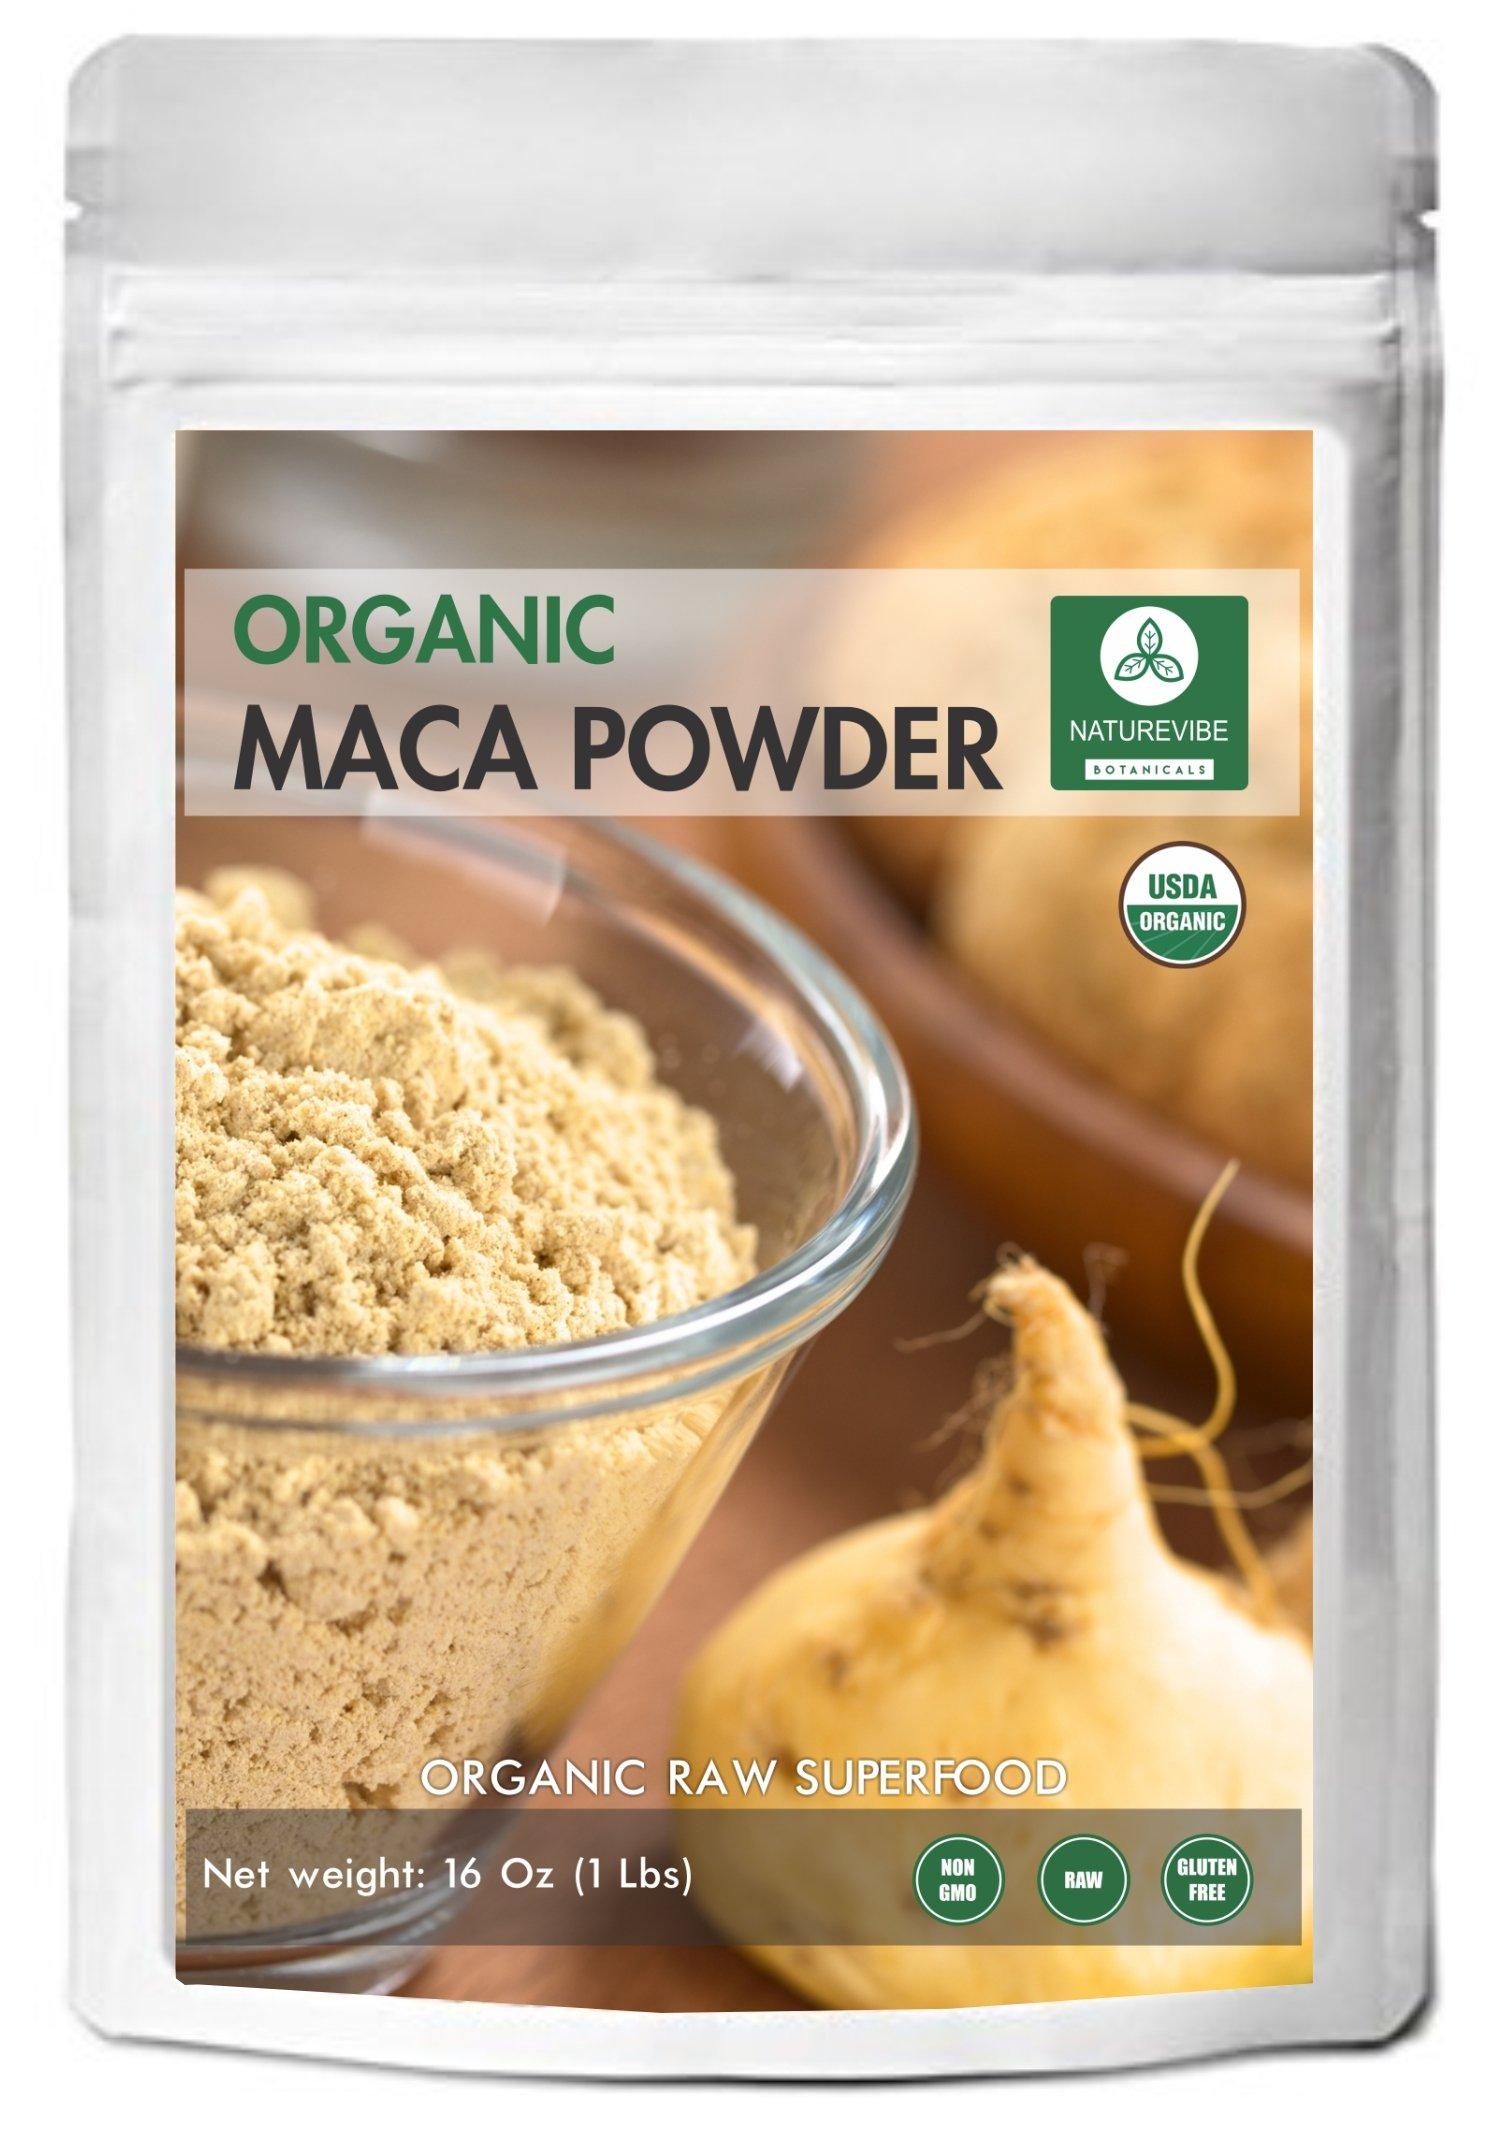 Naturevibe Botanicals USDA Organic Maca Powder (1lb) - Gluten-Free & Non-GMO (16 ounces)